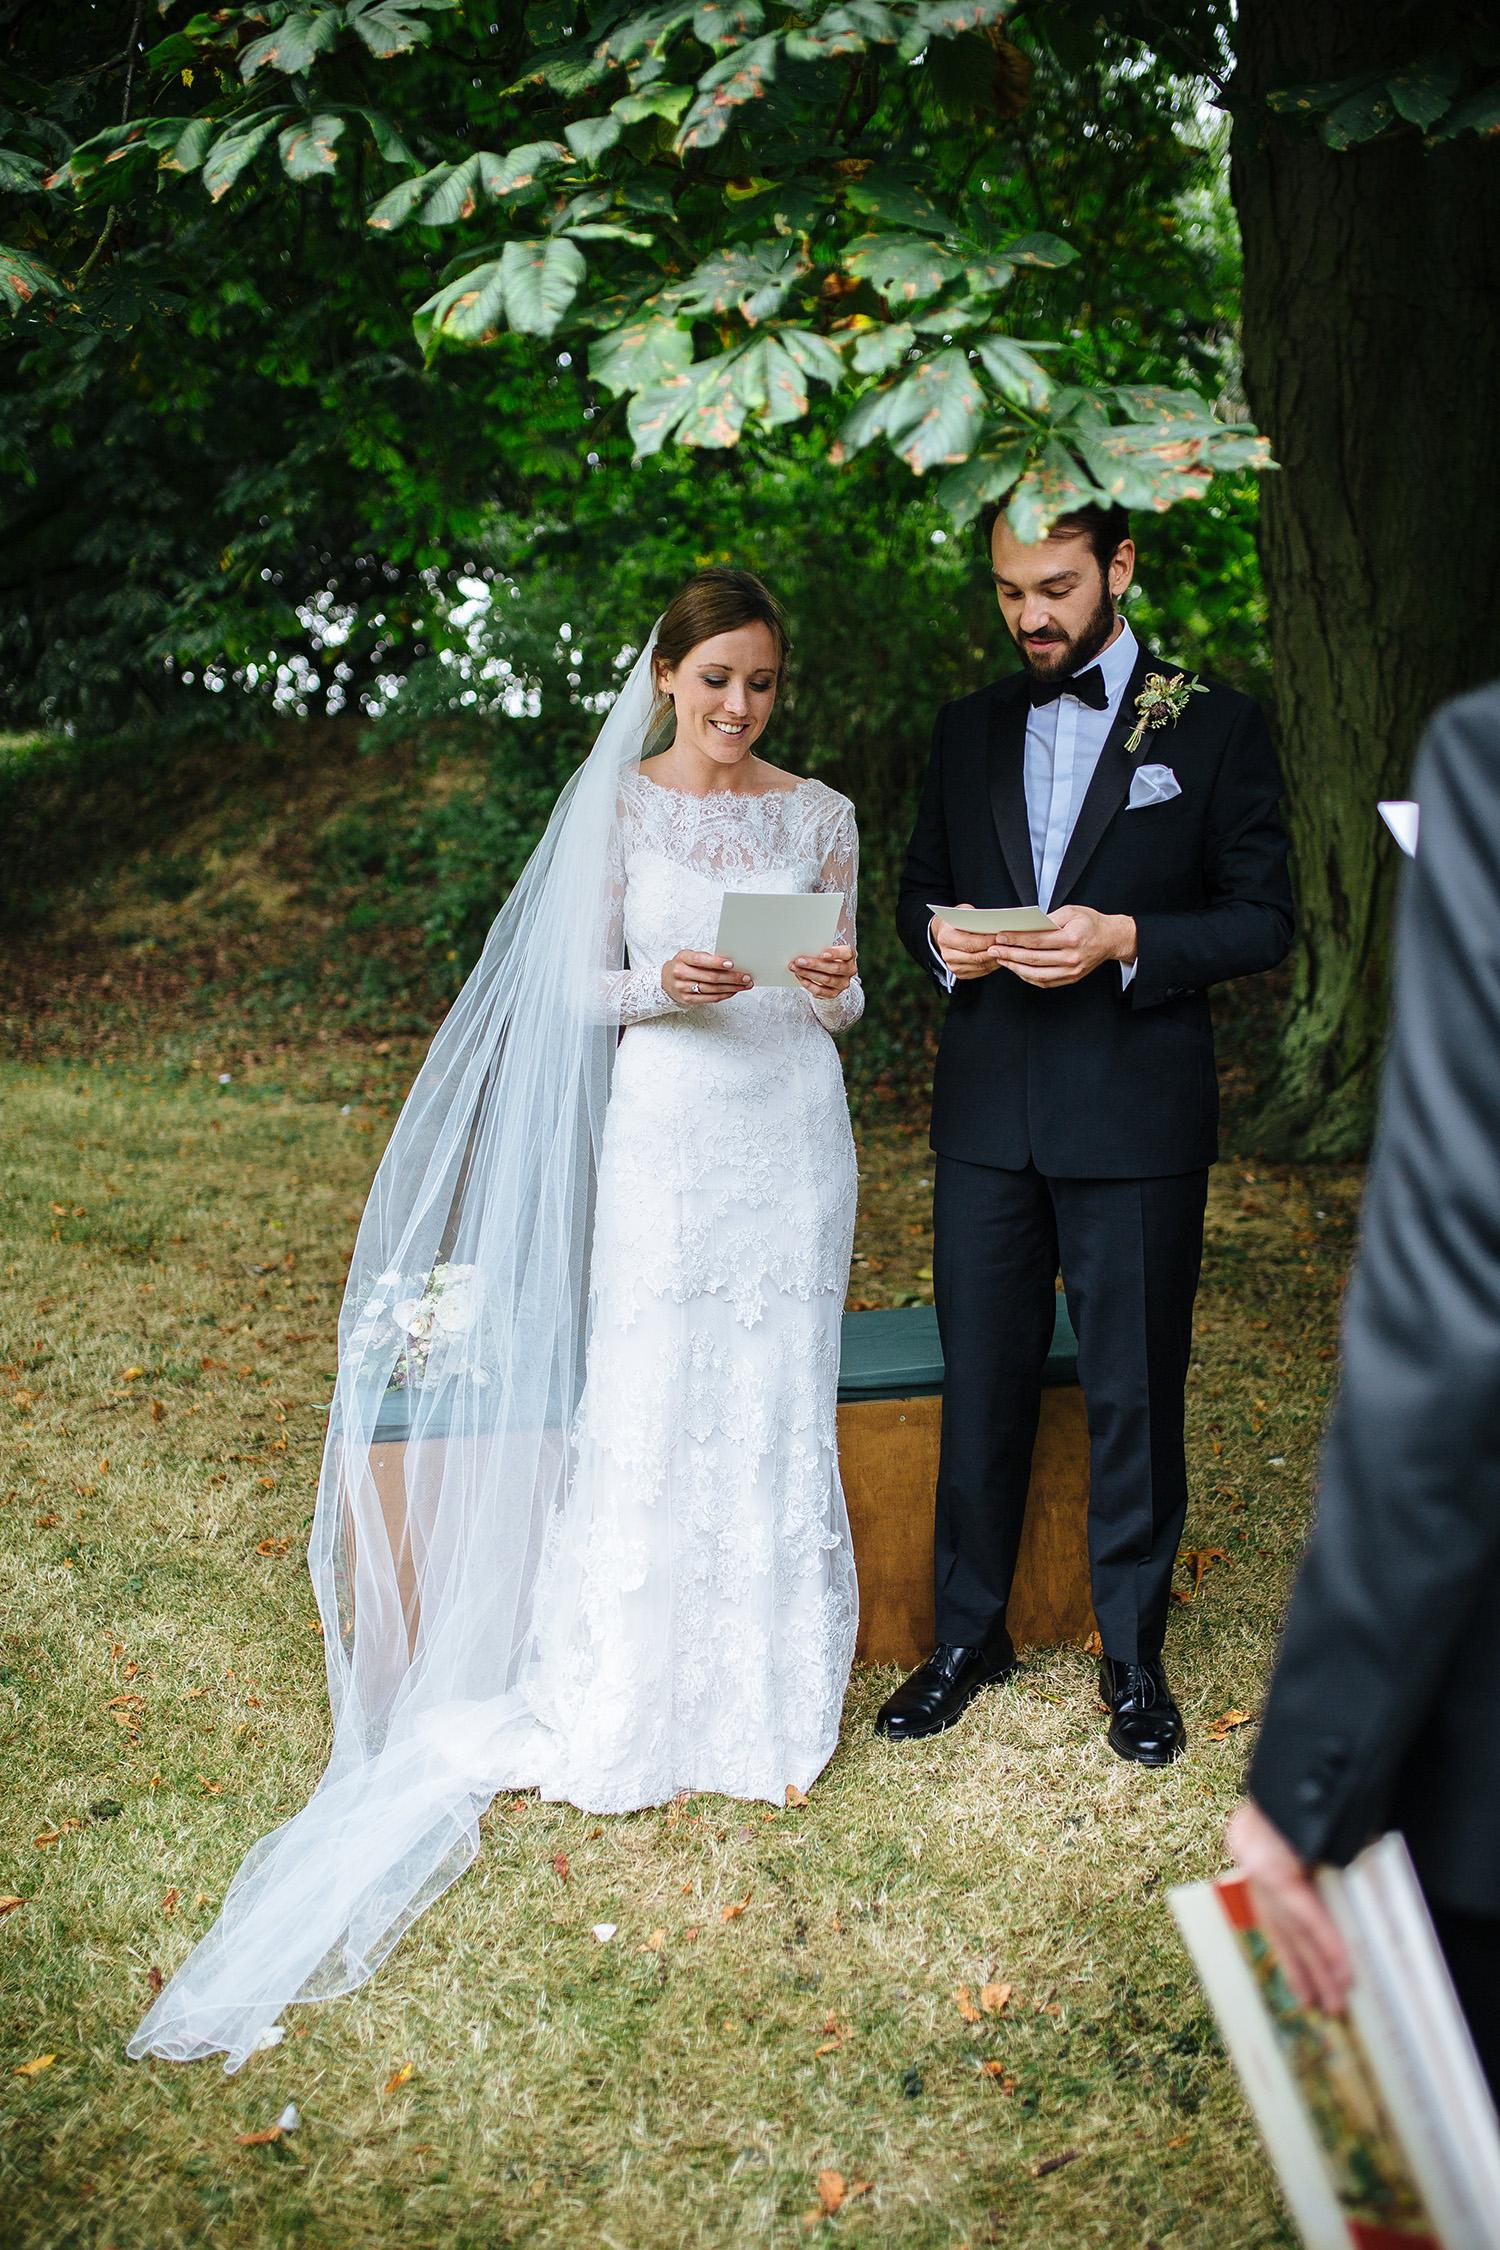 CHILDERLEY HALL CAMBRIDGE WEDDING 38.JPG